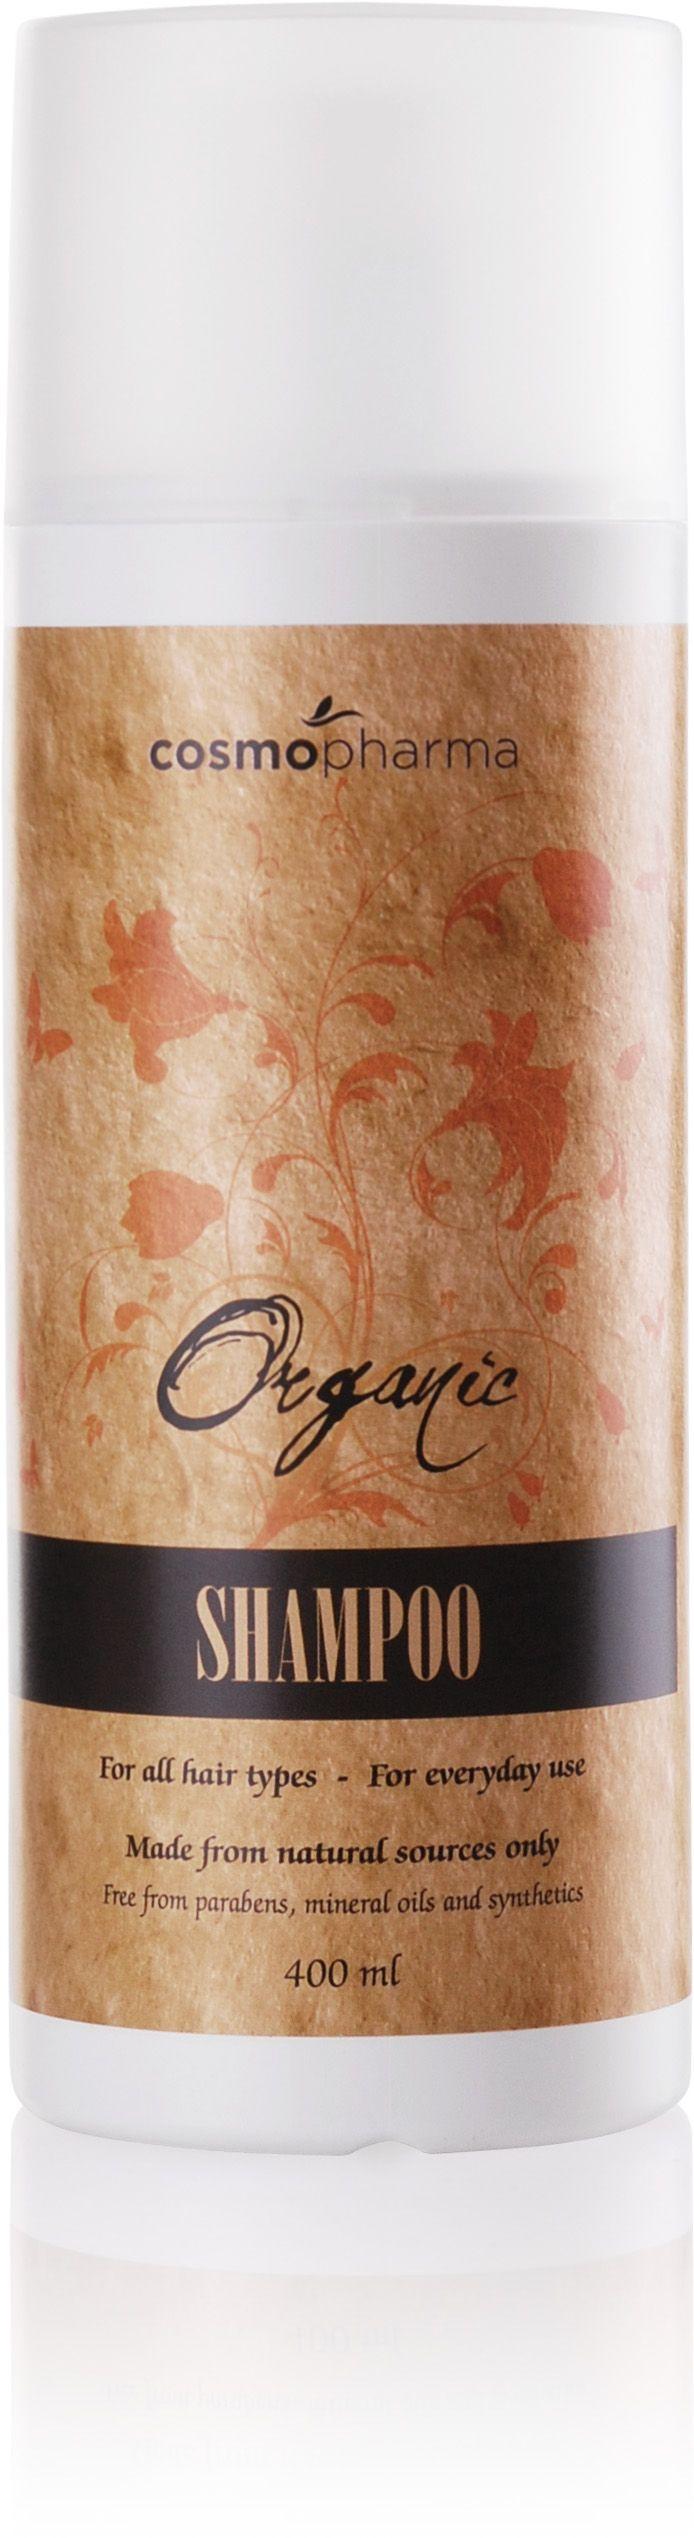 www.cosmopharmas.com produkter 530-Organic-Shampoo